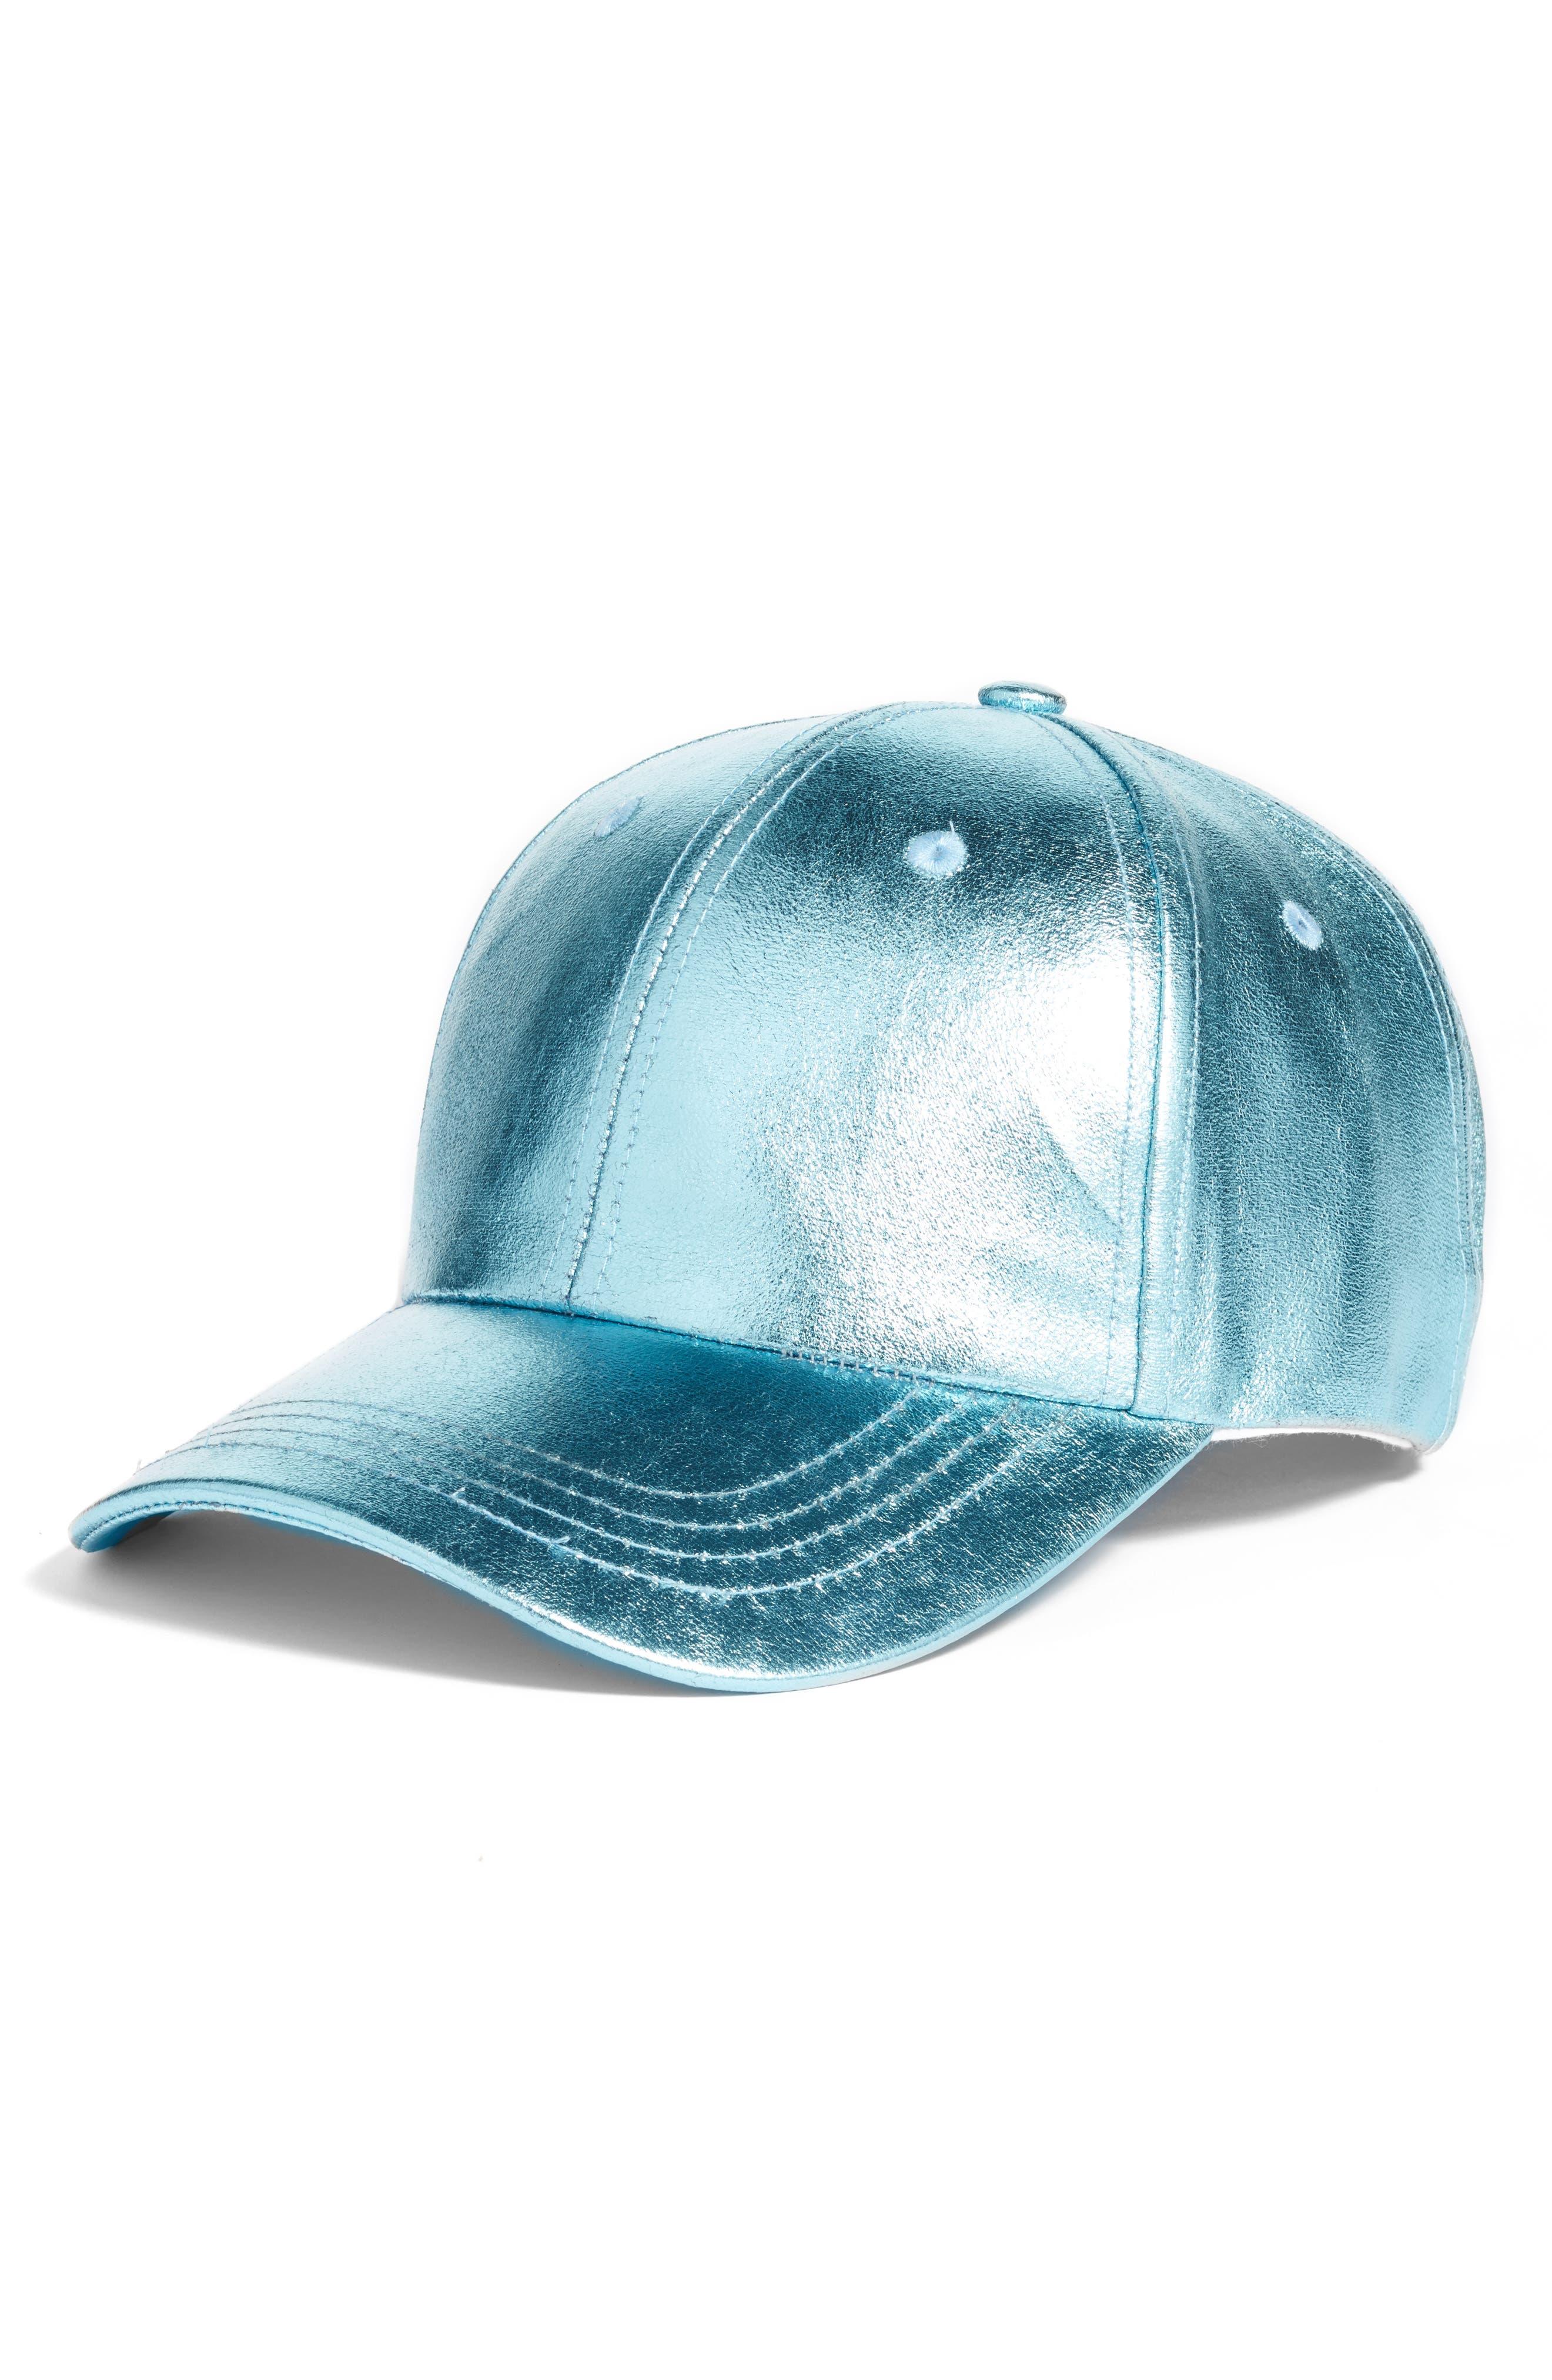 Crackled Metallic Baseball Cap,                         Main,                         color, Blue